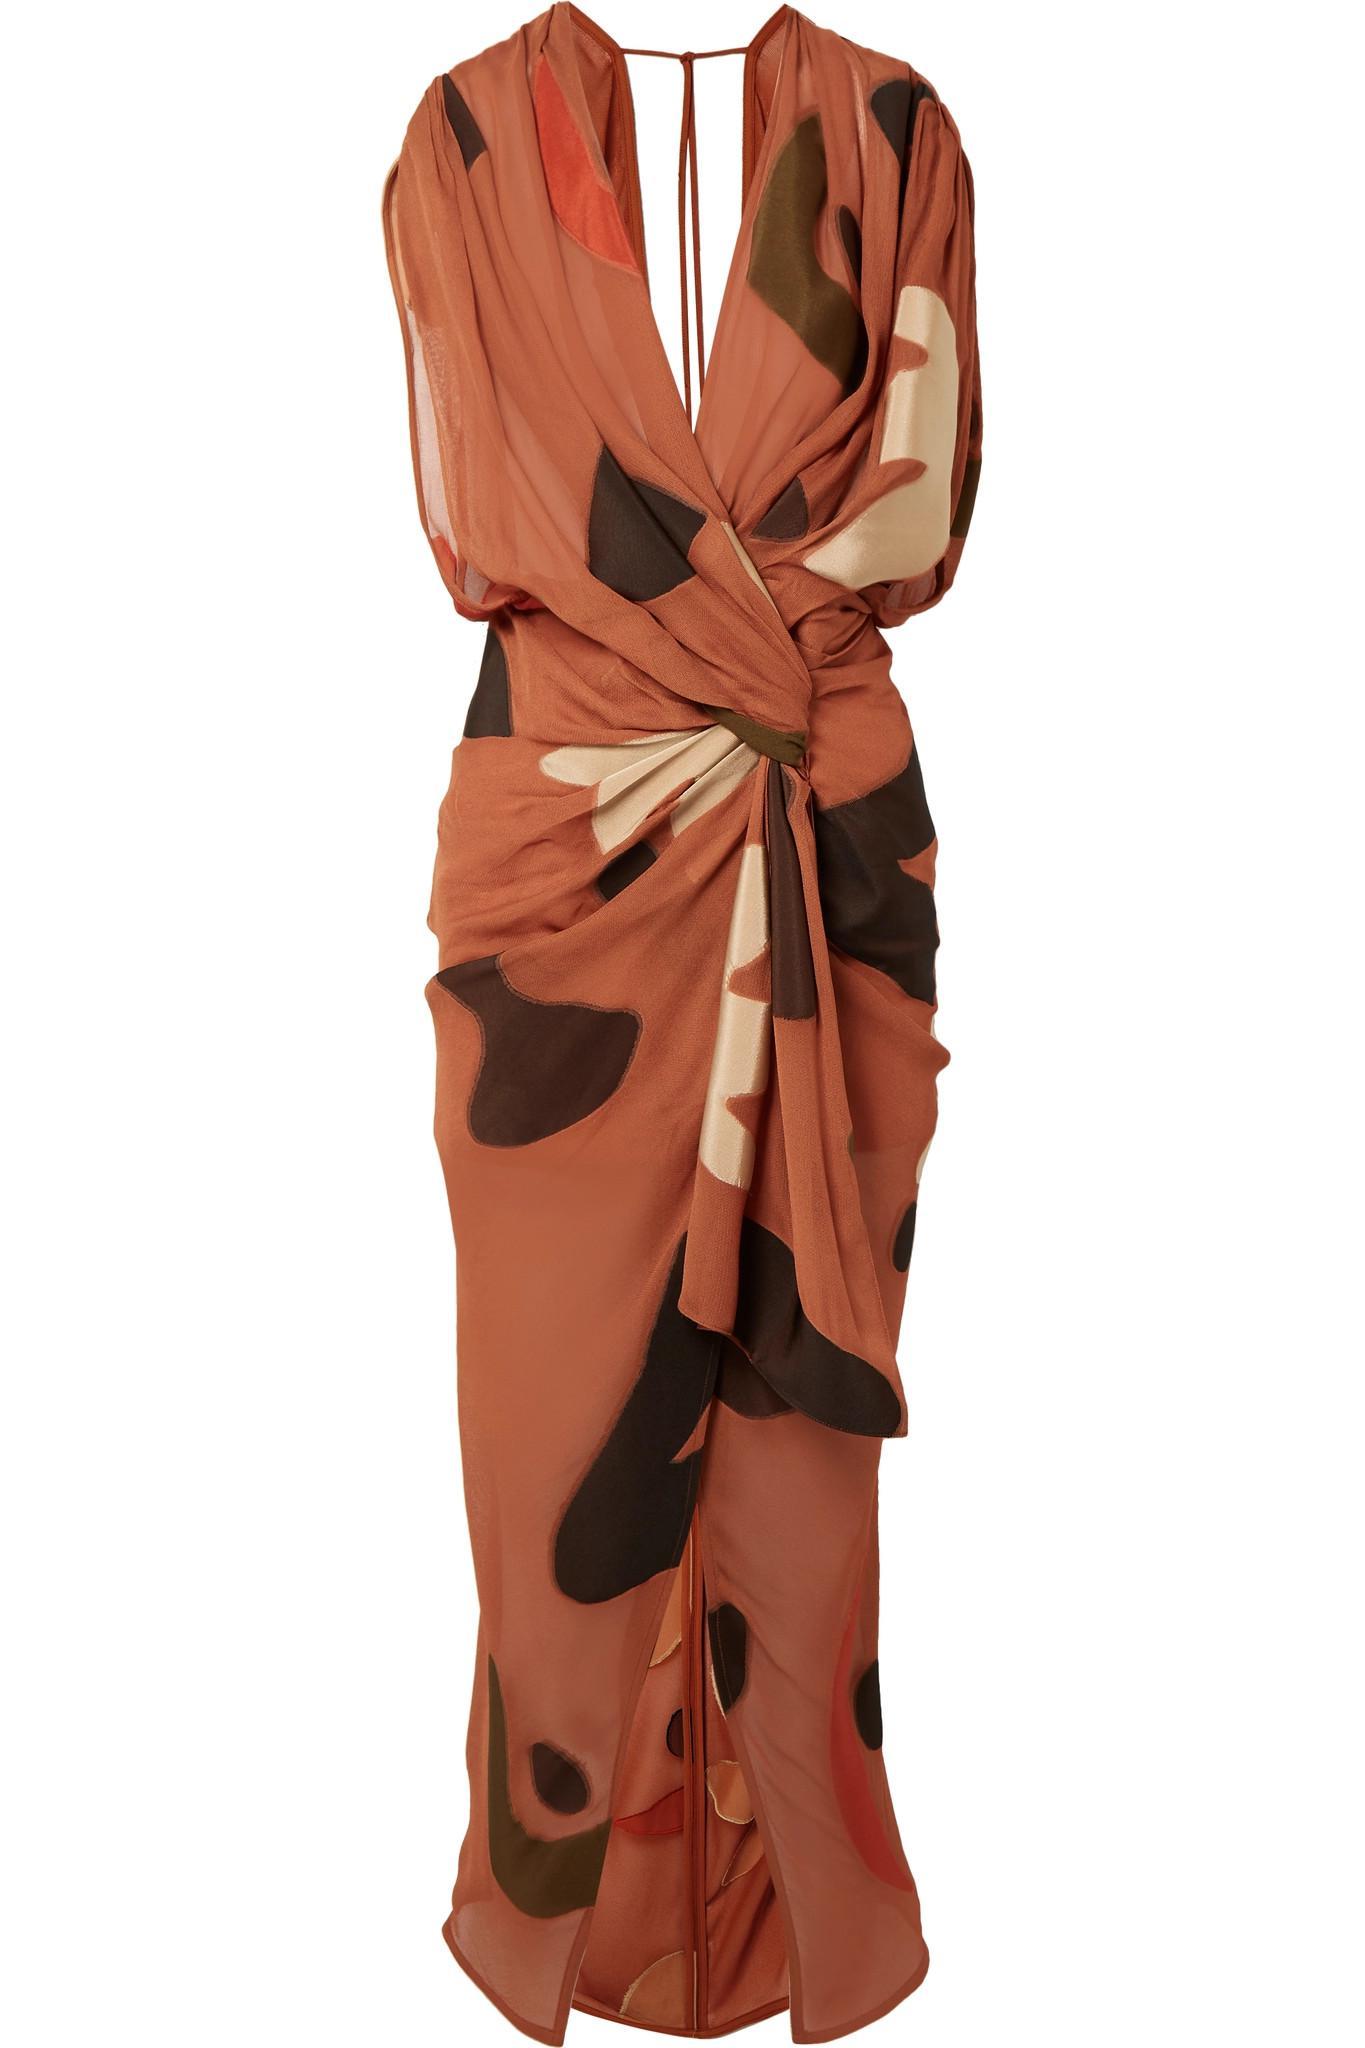 La Robe Henri Asymmetric Twisted Fil Coupé Dress - Brown Jacquemus gklLsBoHr